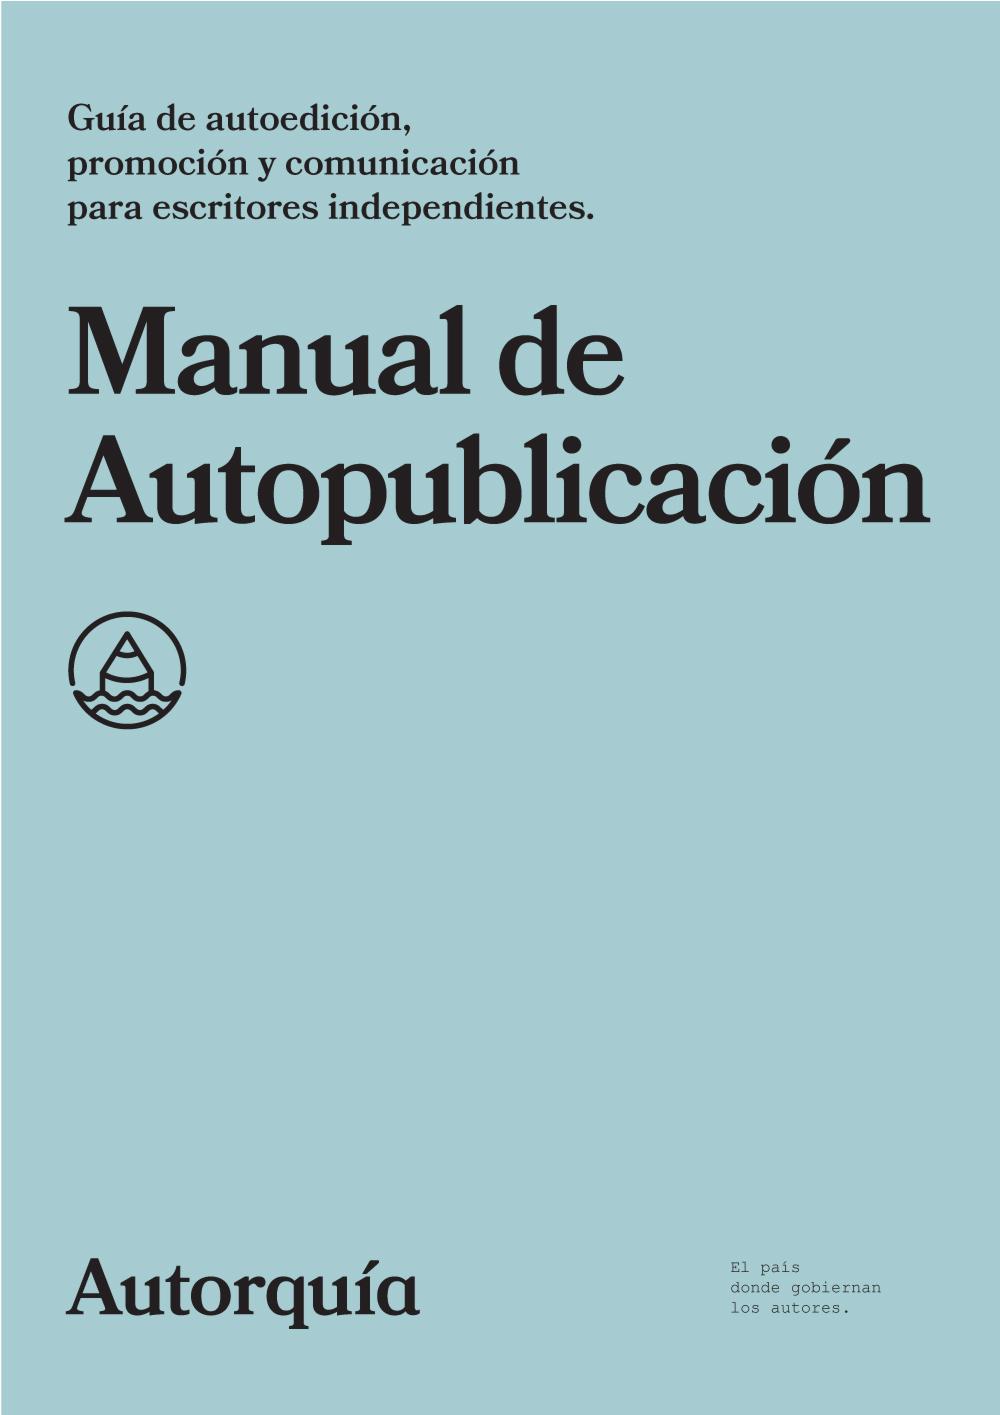 Manual_autopublicacion_autorquia.jpg